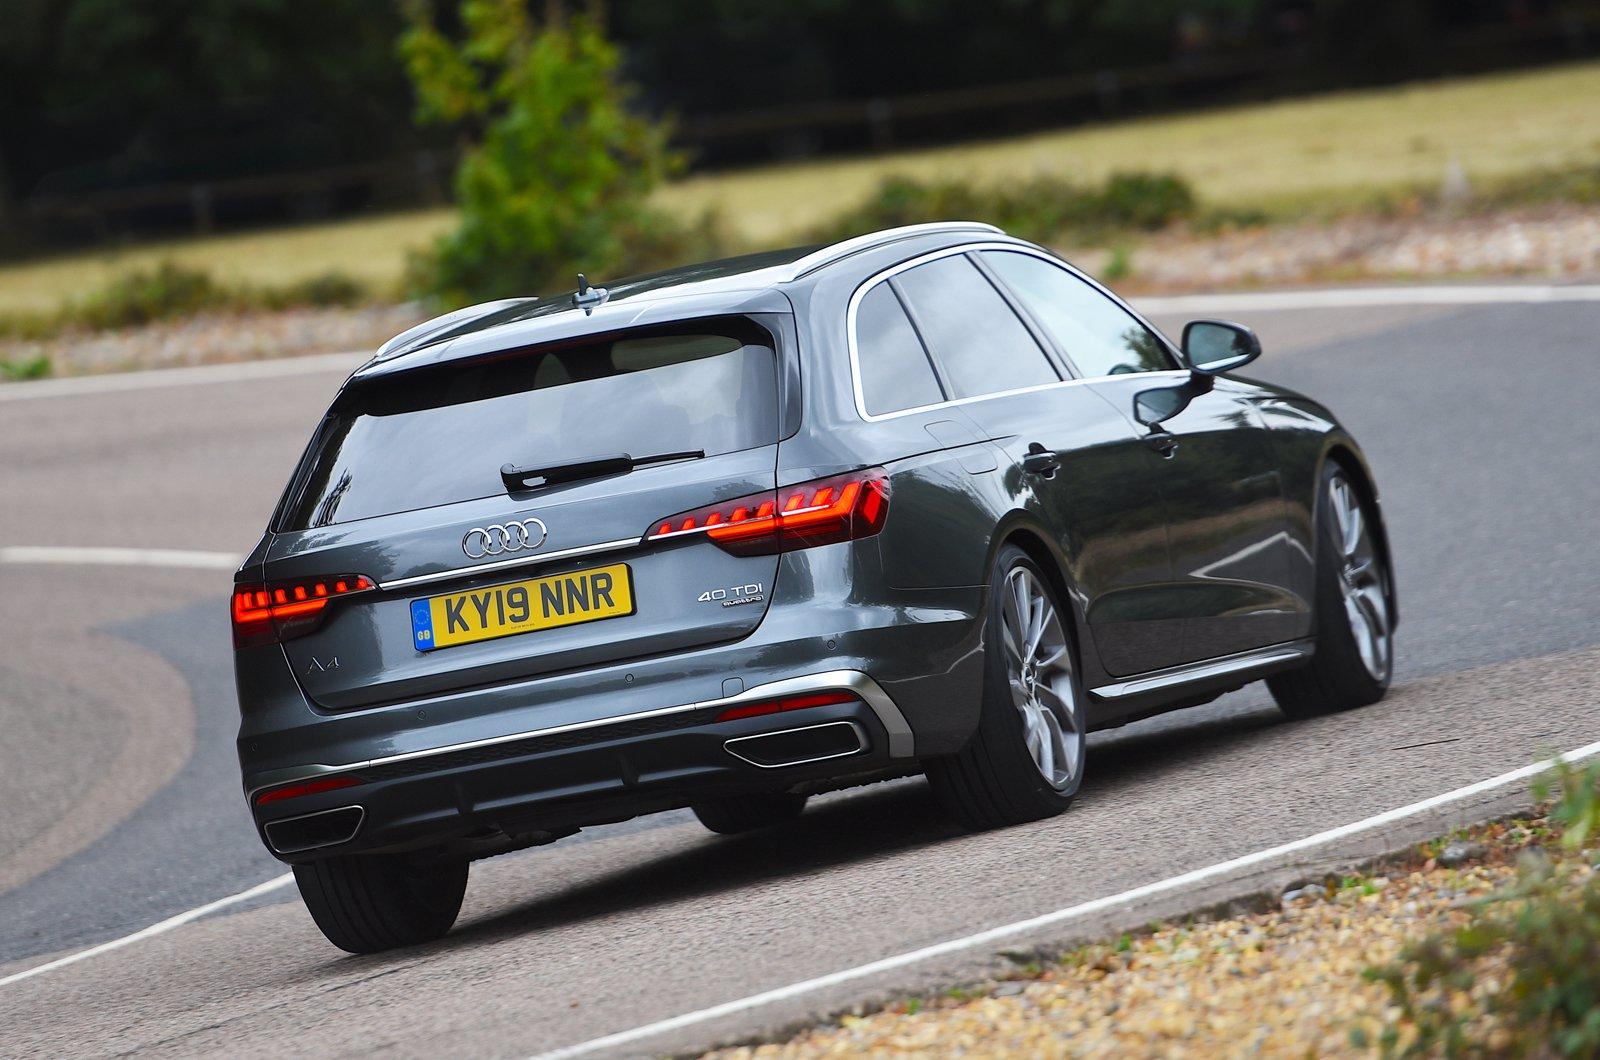 Audi A4 Avant rear cornering